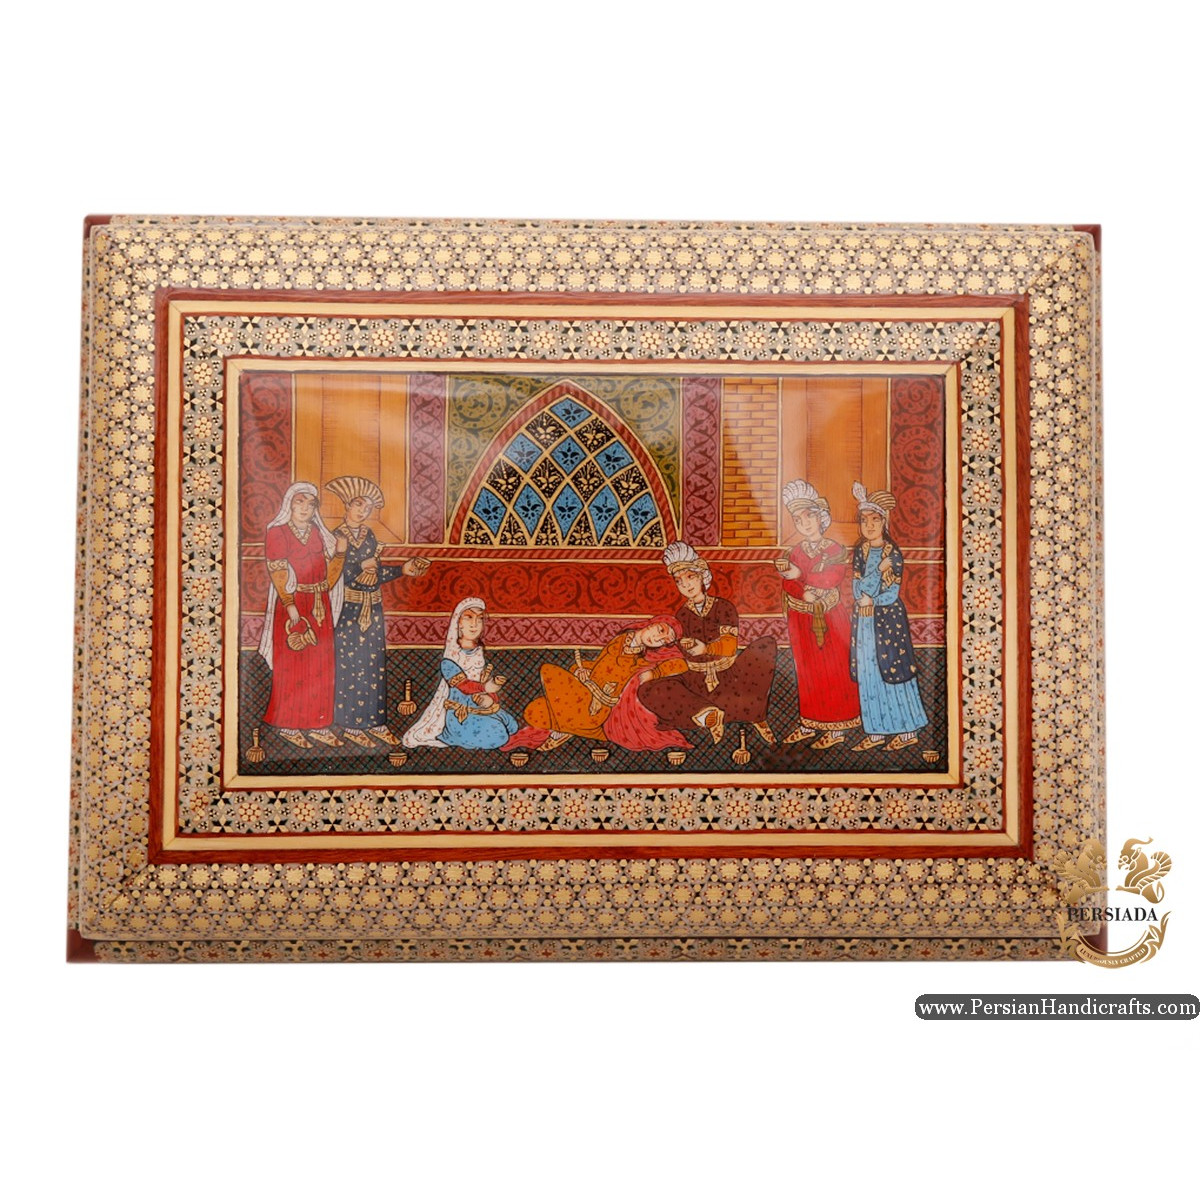 Luxurious Decor Box   Miniature Khatam Marquetry   HKH6111   Persiada